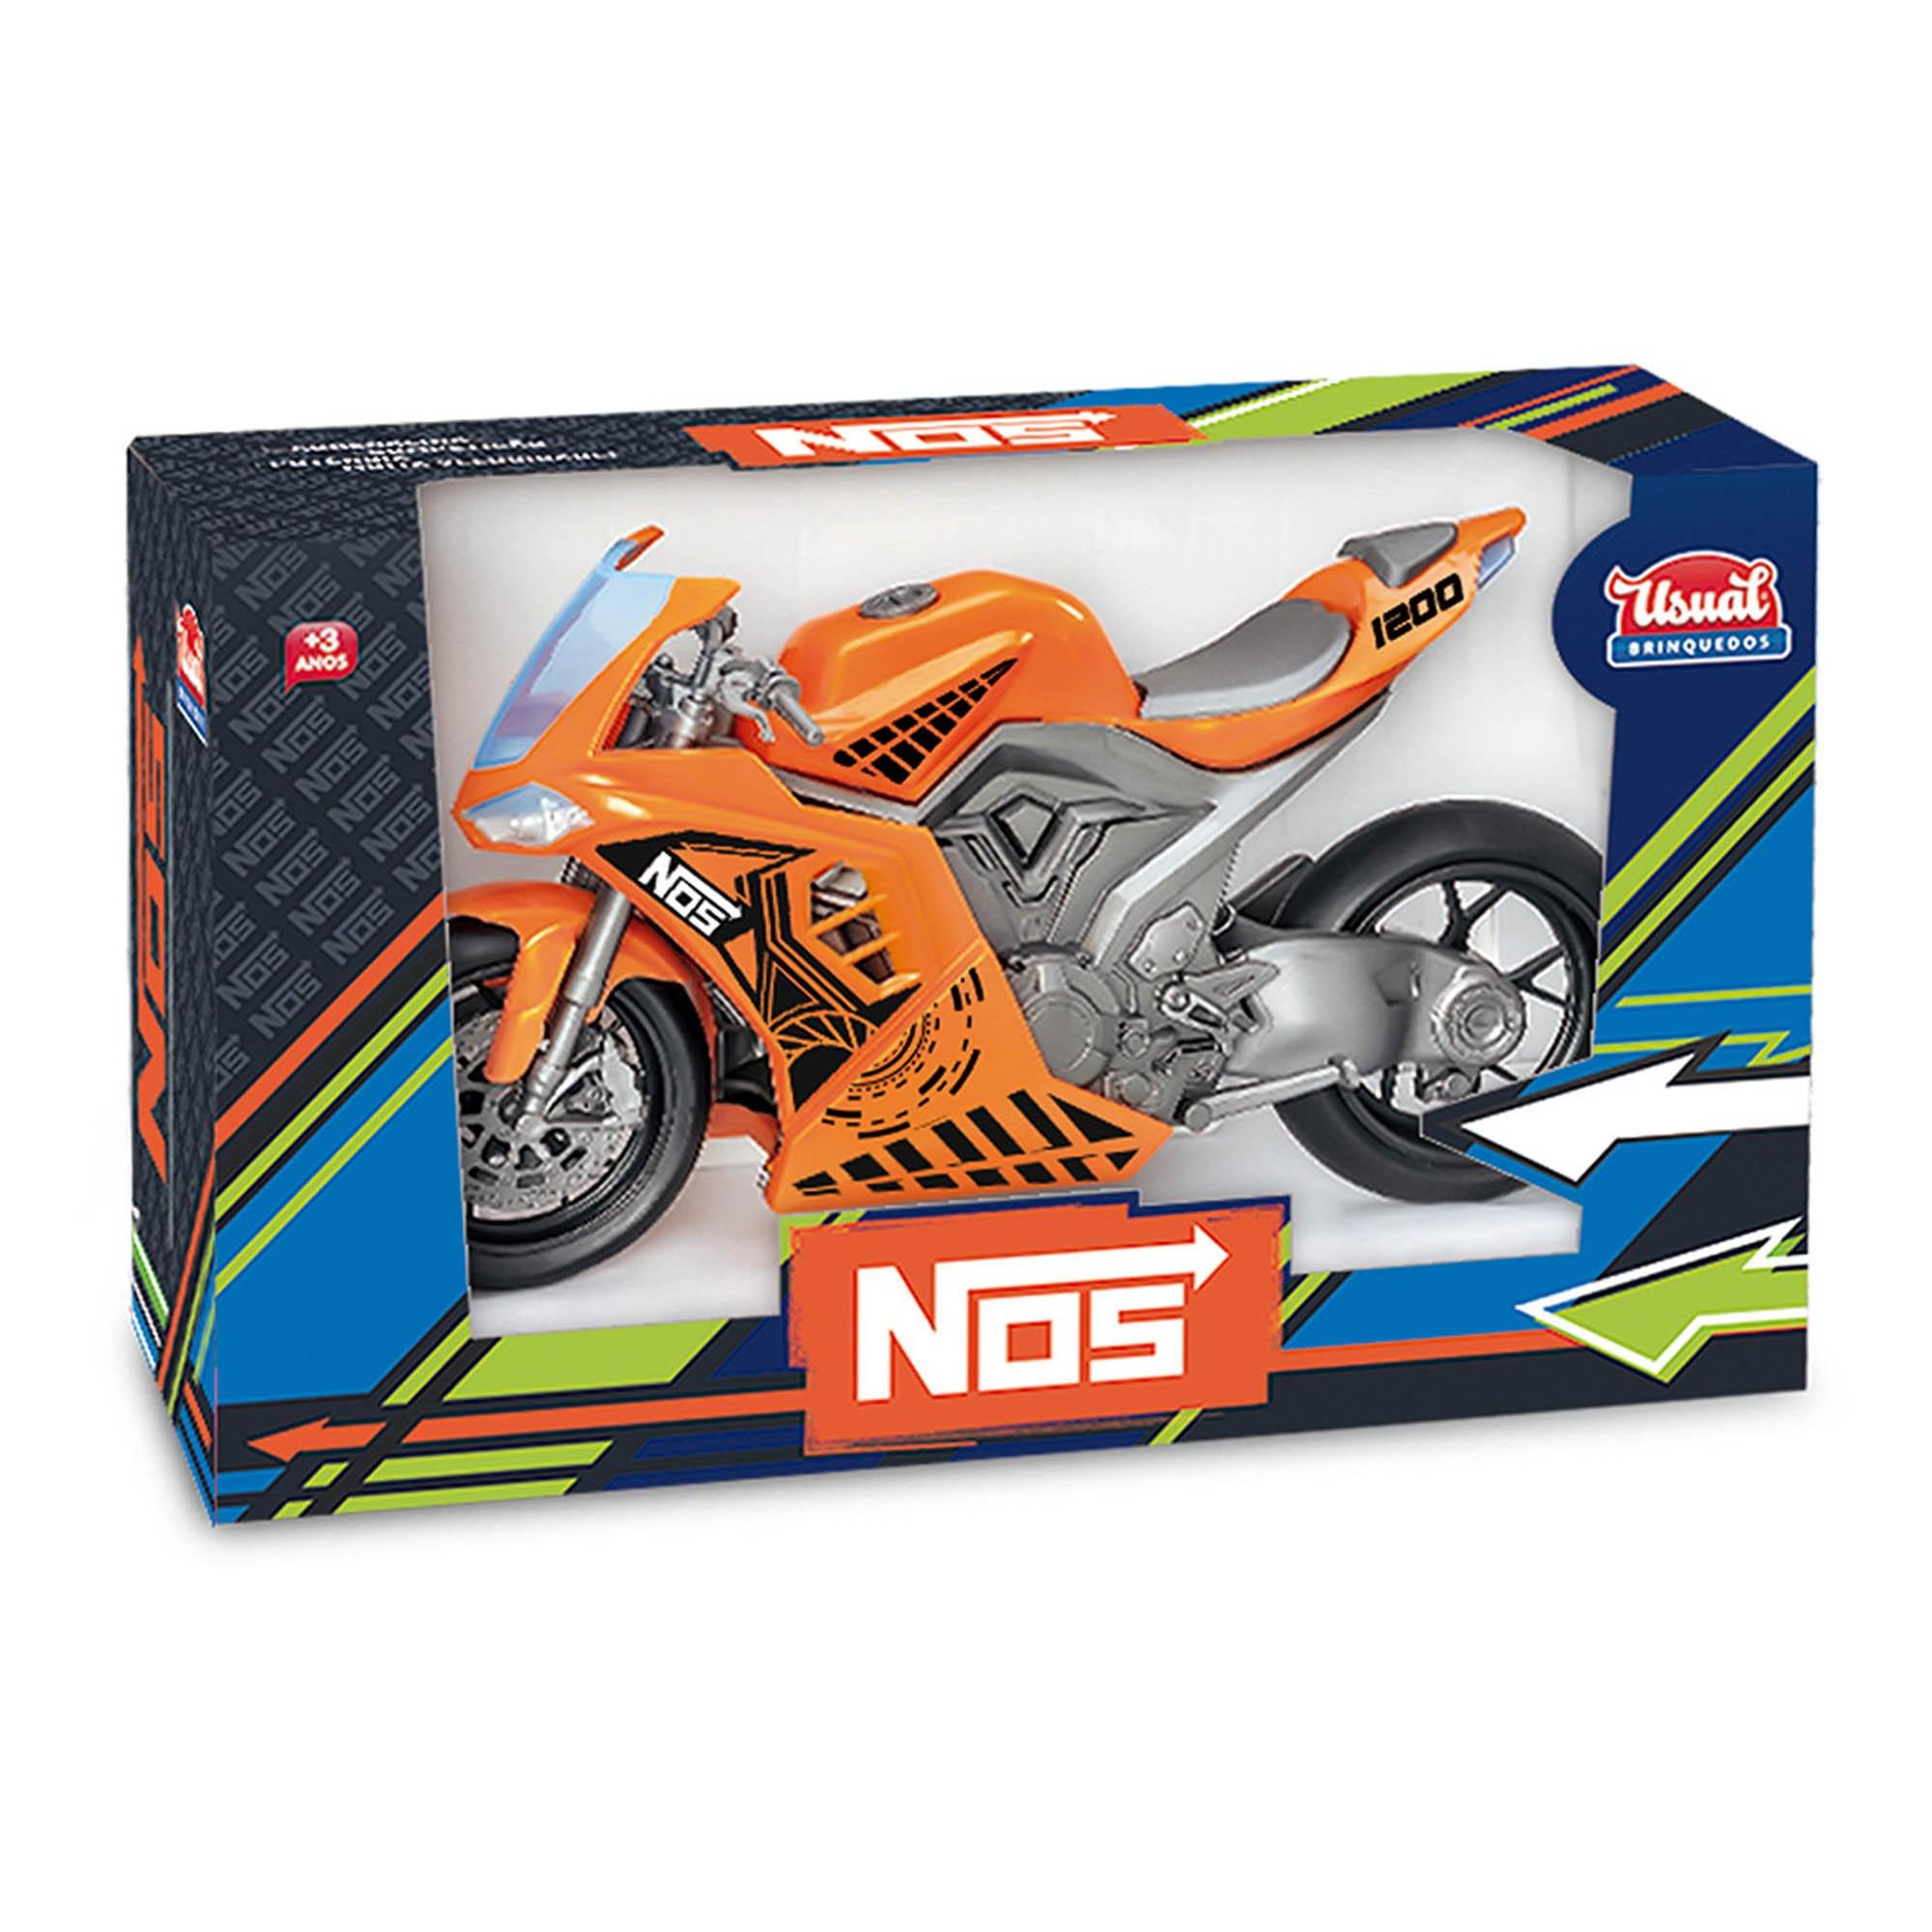 Moto Nos 1200 Sport - Usual Brinquedos